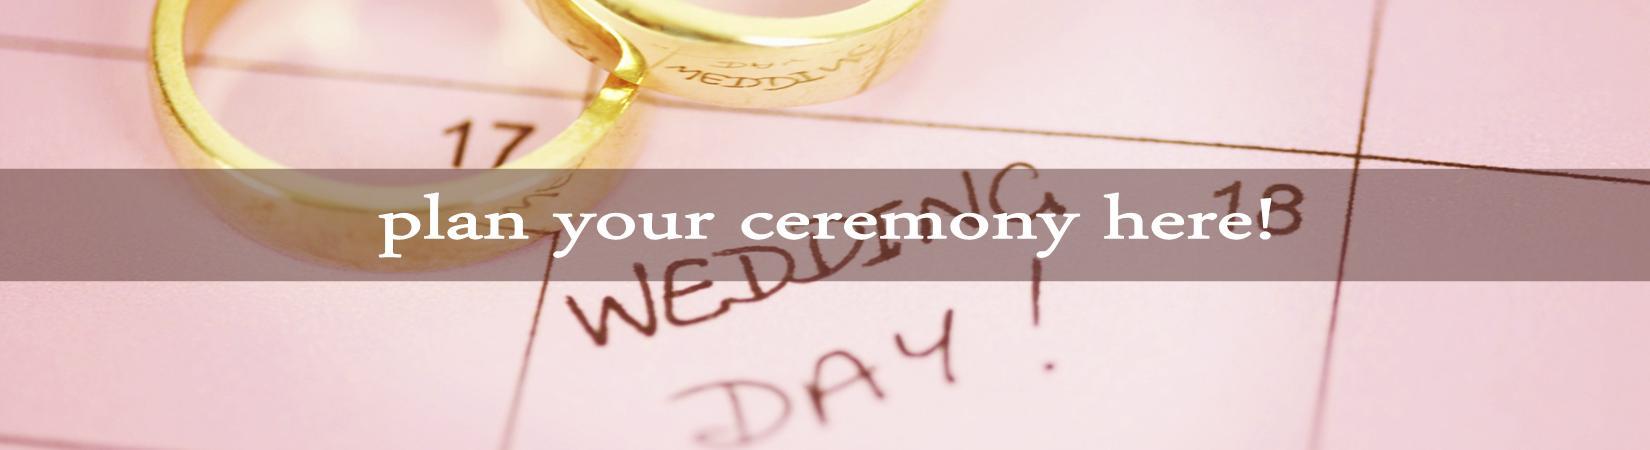 wedding planning.jpg